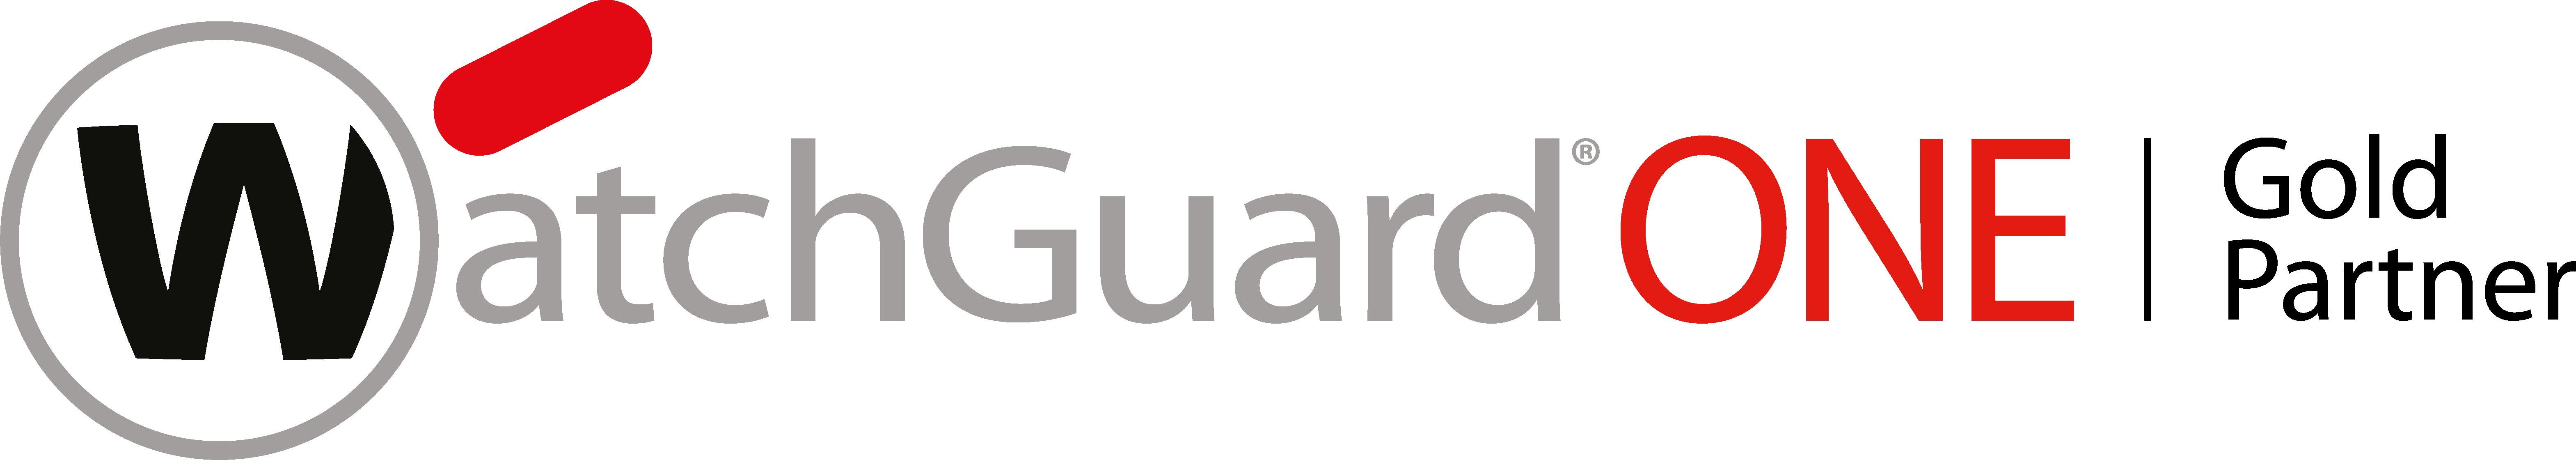 WatchGuardONE-Gold-logo